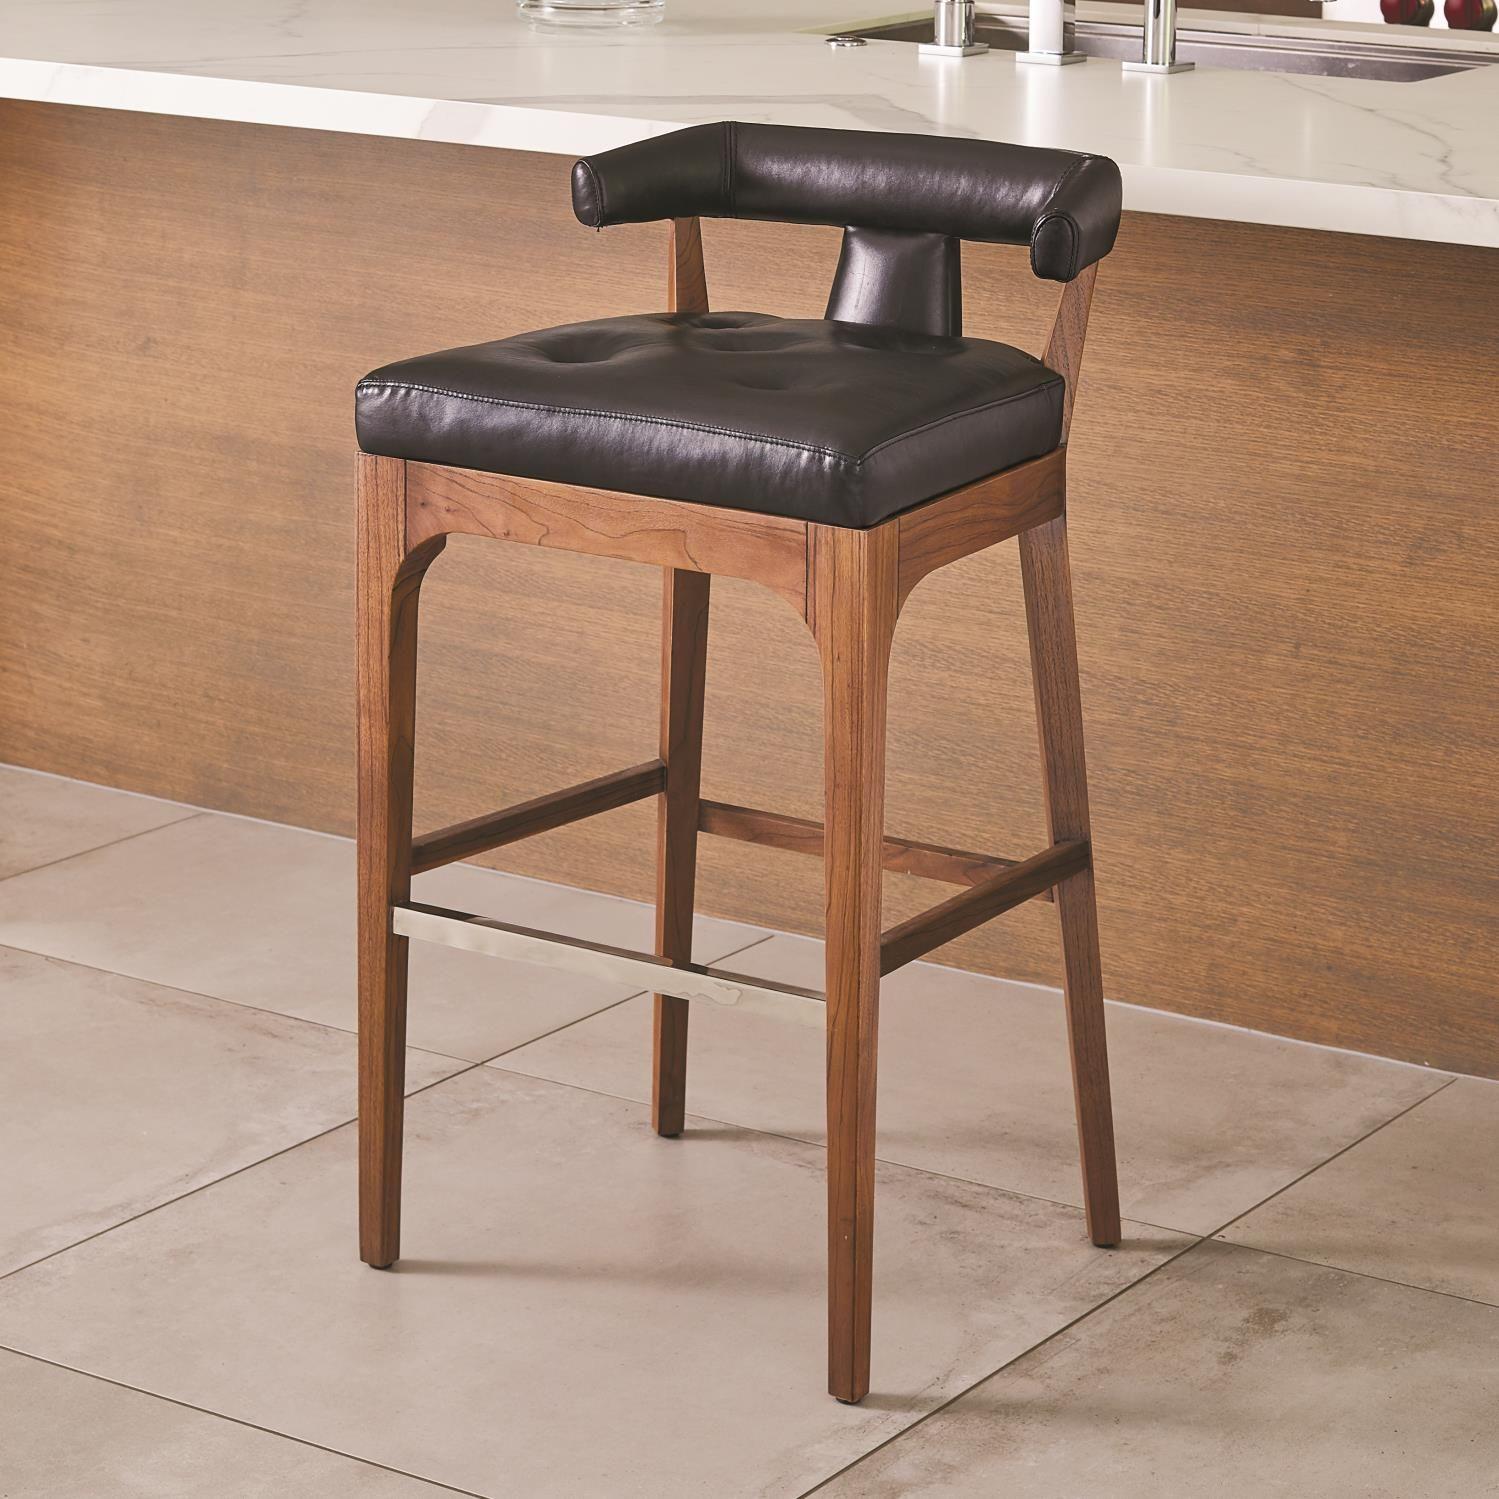 Awesome Moderno Bar Stool Black Marble Leather Dining Room Creativecarmelina Interior Chair Design Creativecarmelinacom